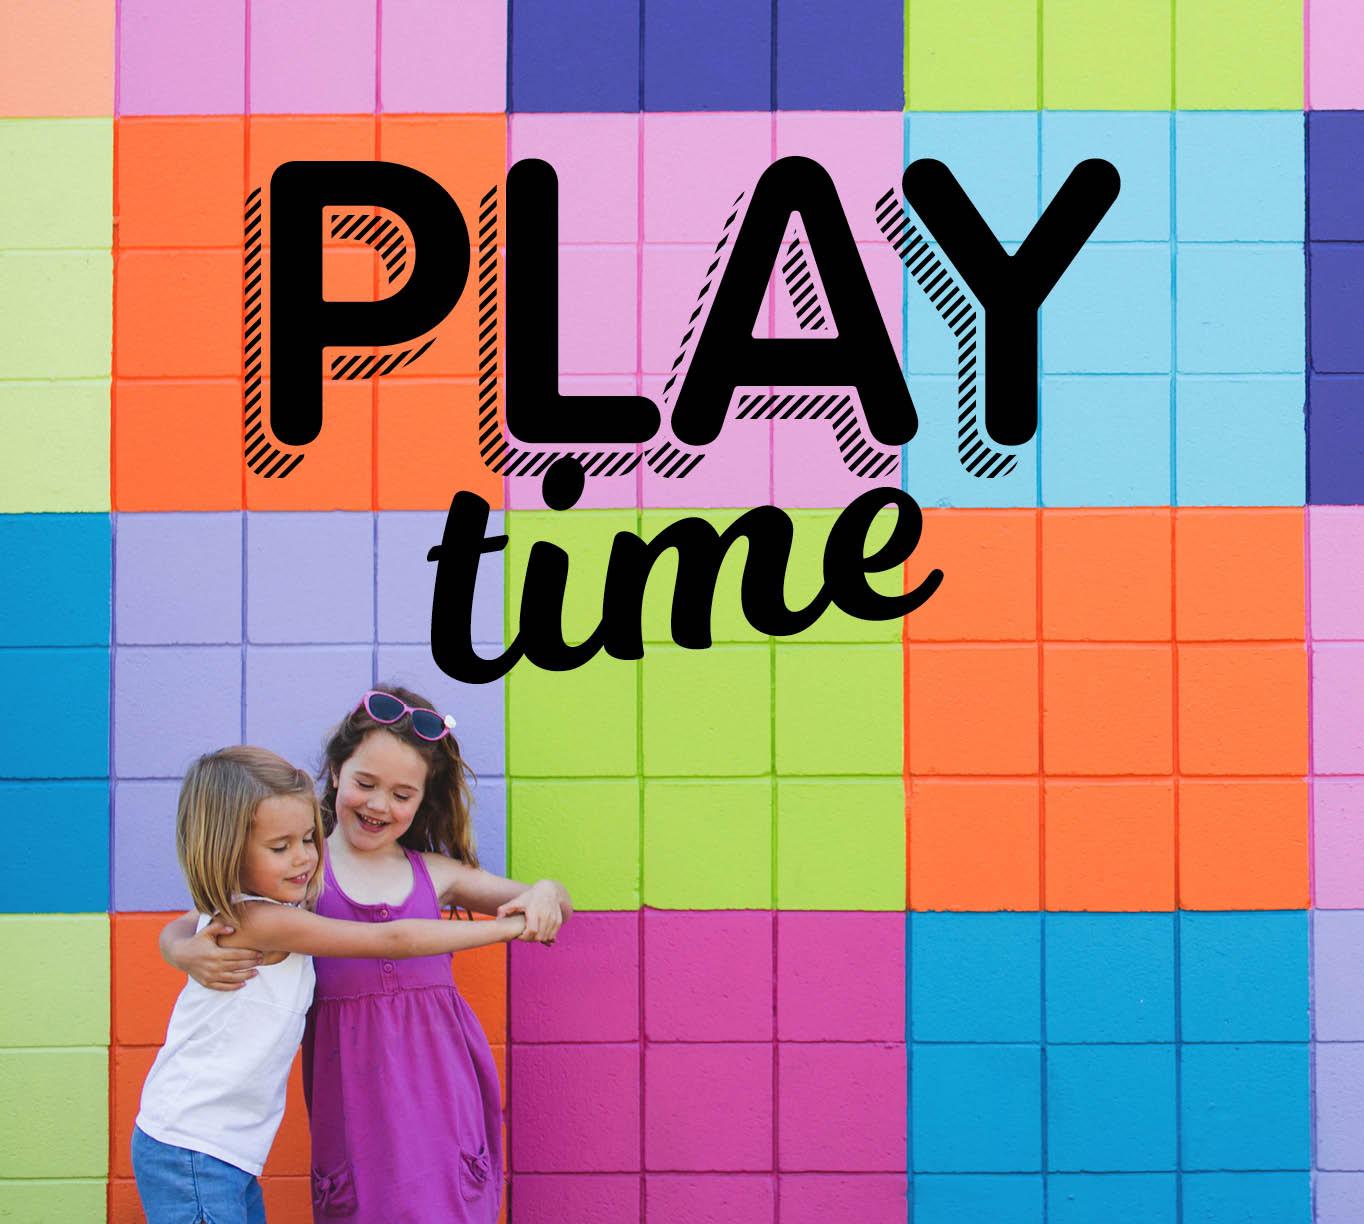 CH5400_Charter Hall_CTM_Kids Playtime Creative_Web Tiles_682x612